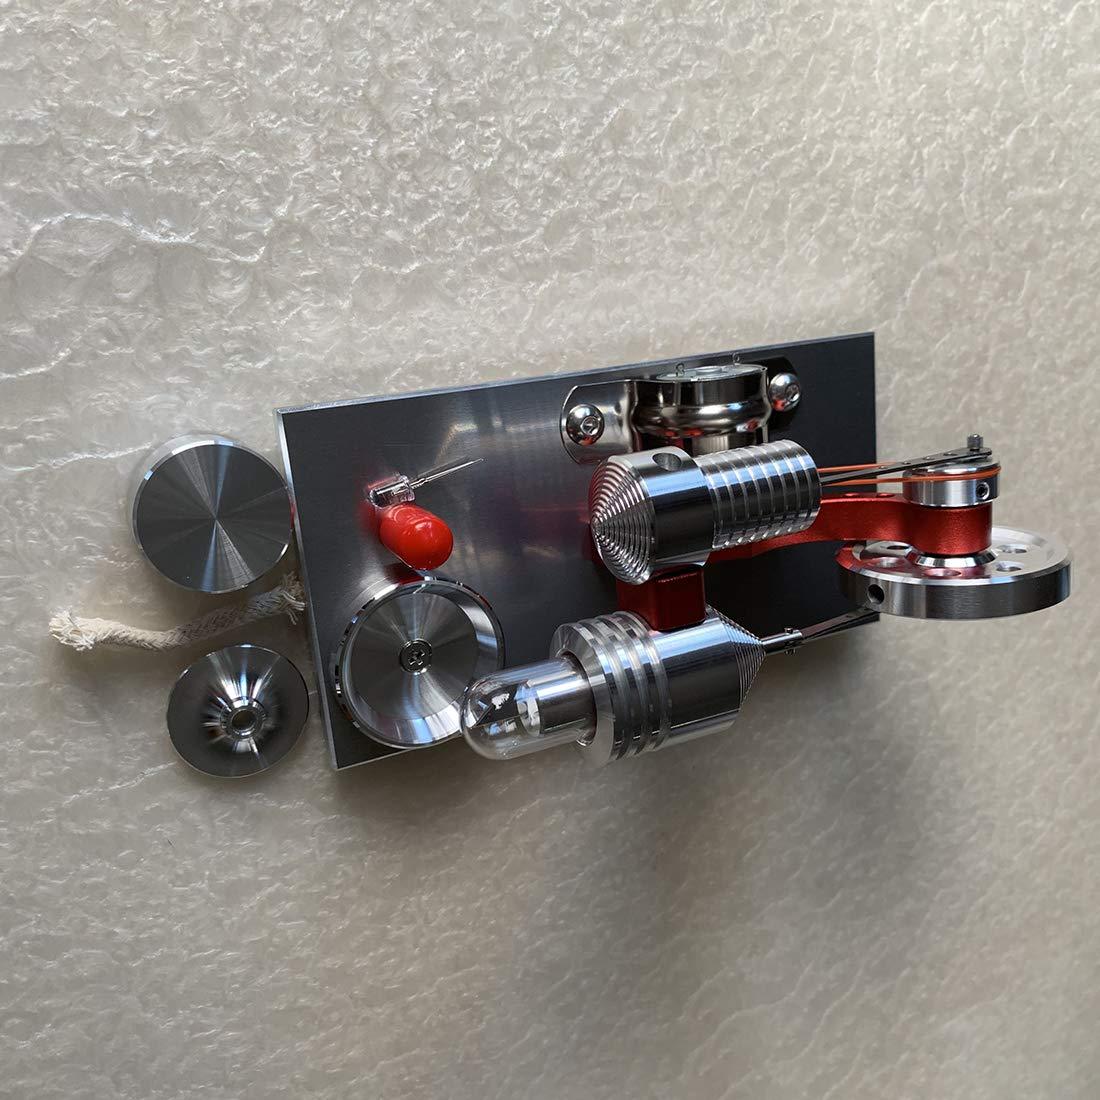 Modell Stirlingmotor mit Generator Stirling Engine DIY Modell Kit Physik Spielzeug f/ür Kinder und Erwachsene PHYNEDI Stirlingmotor Bausatz